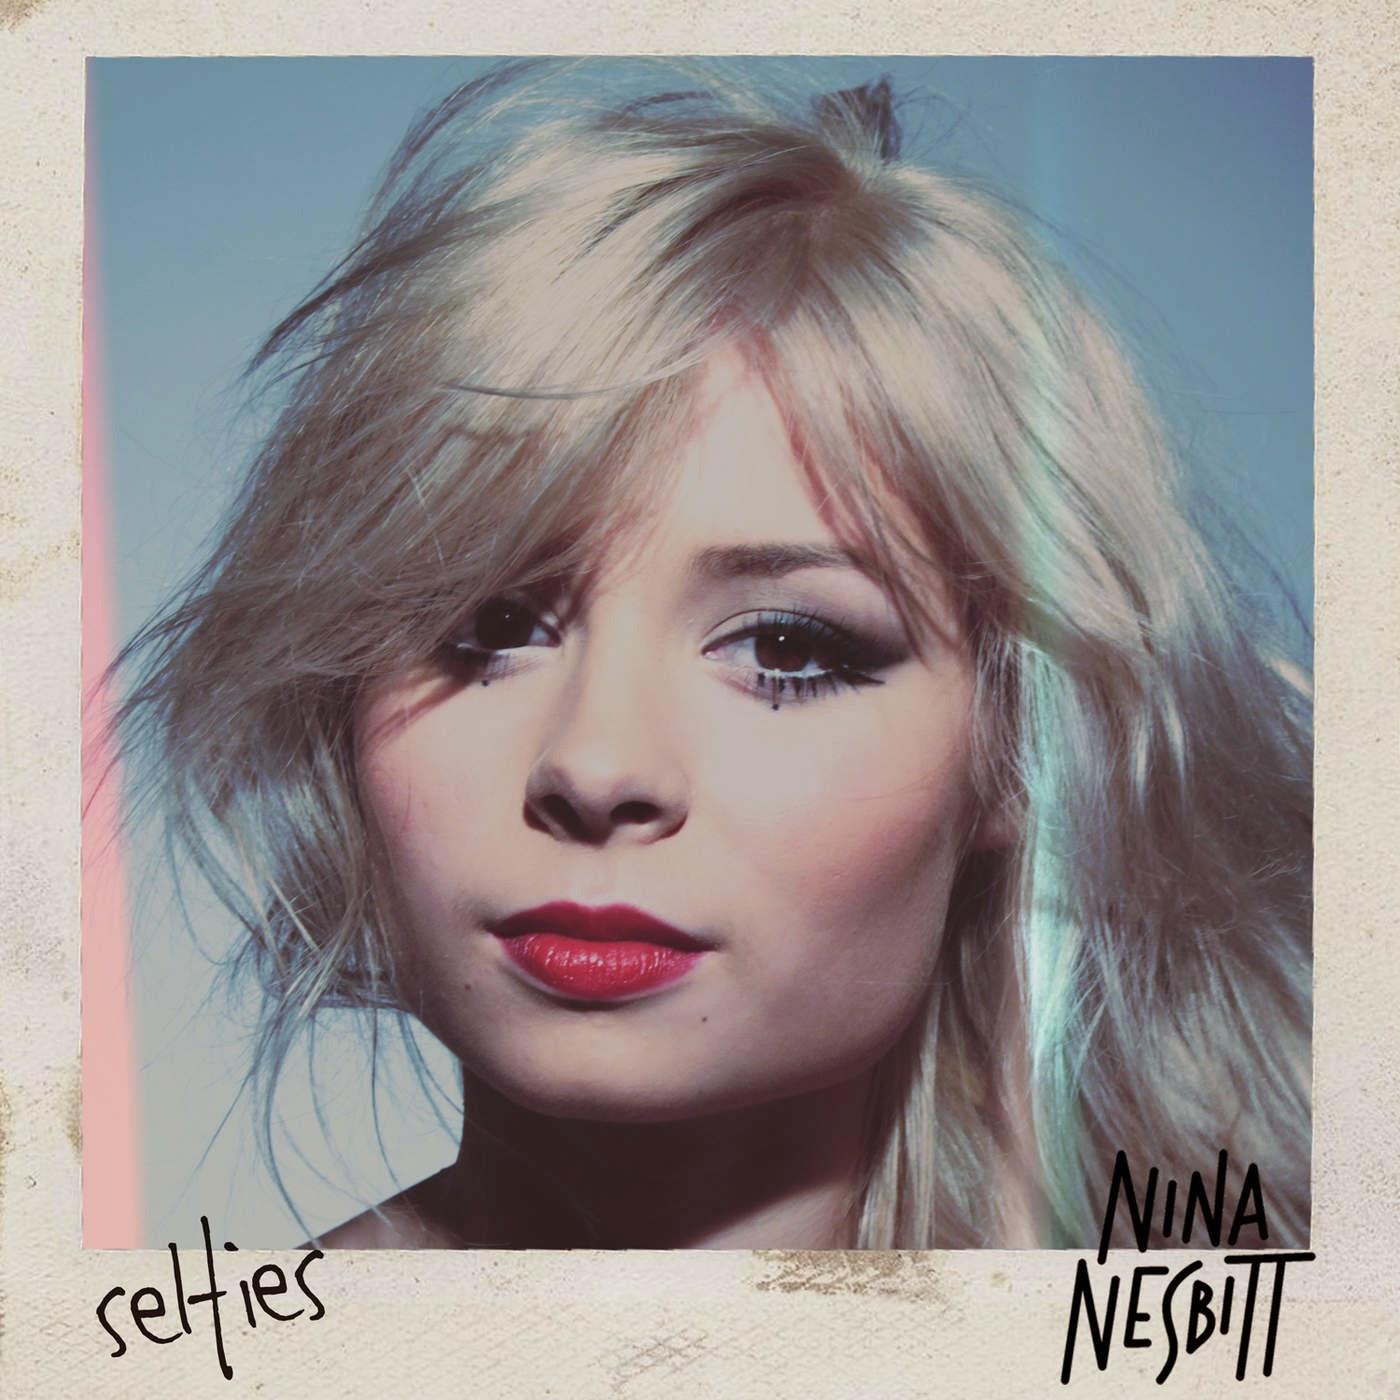 Nina Nesbitt - Selfies - Single